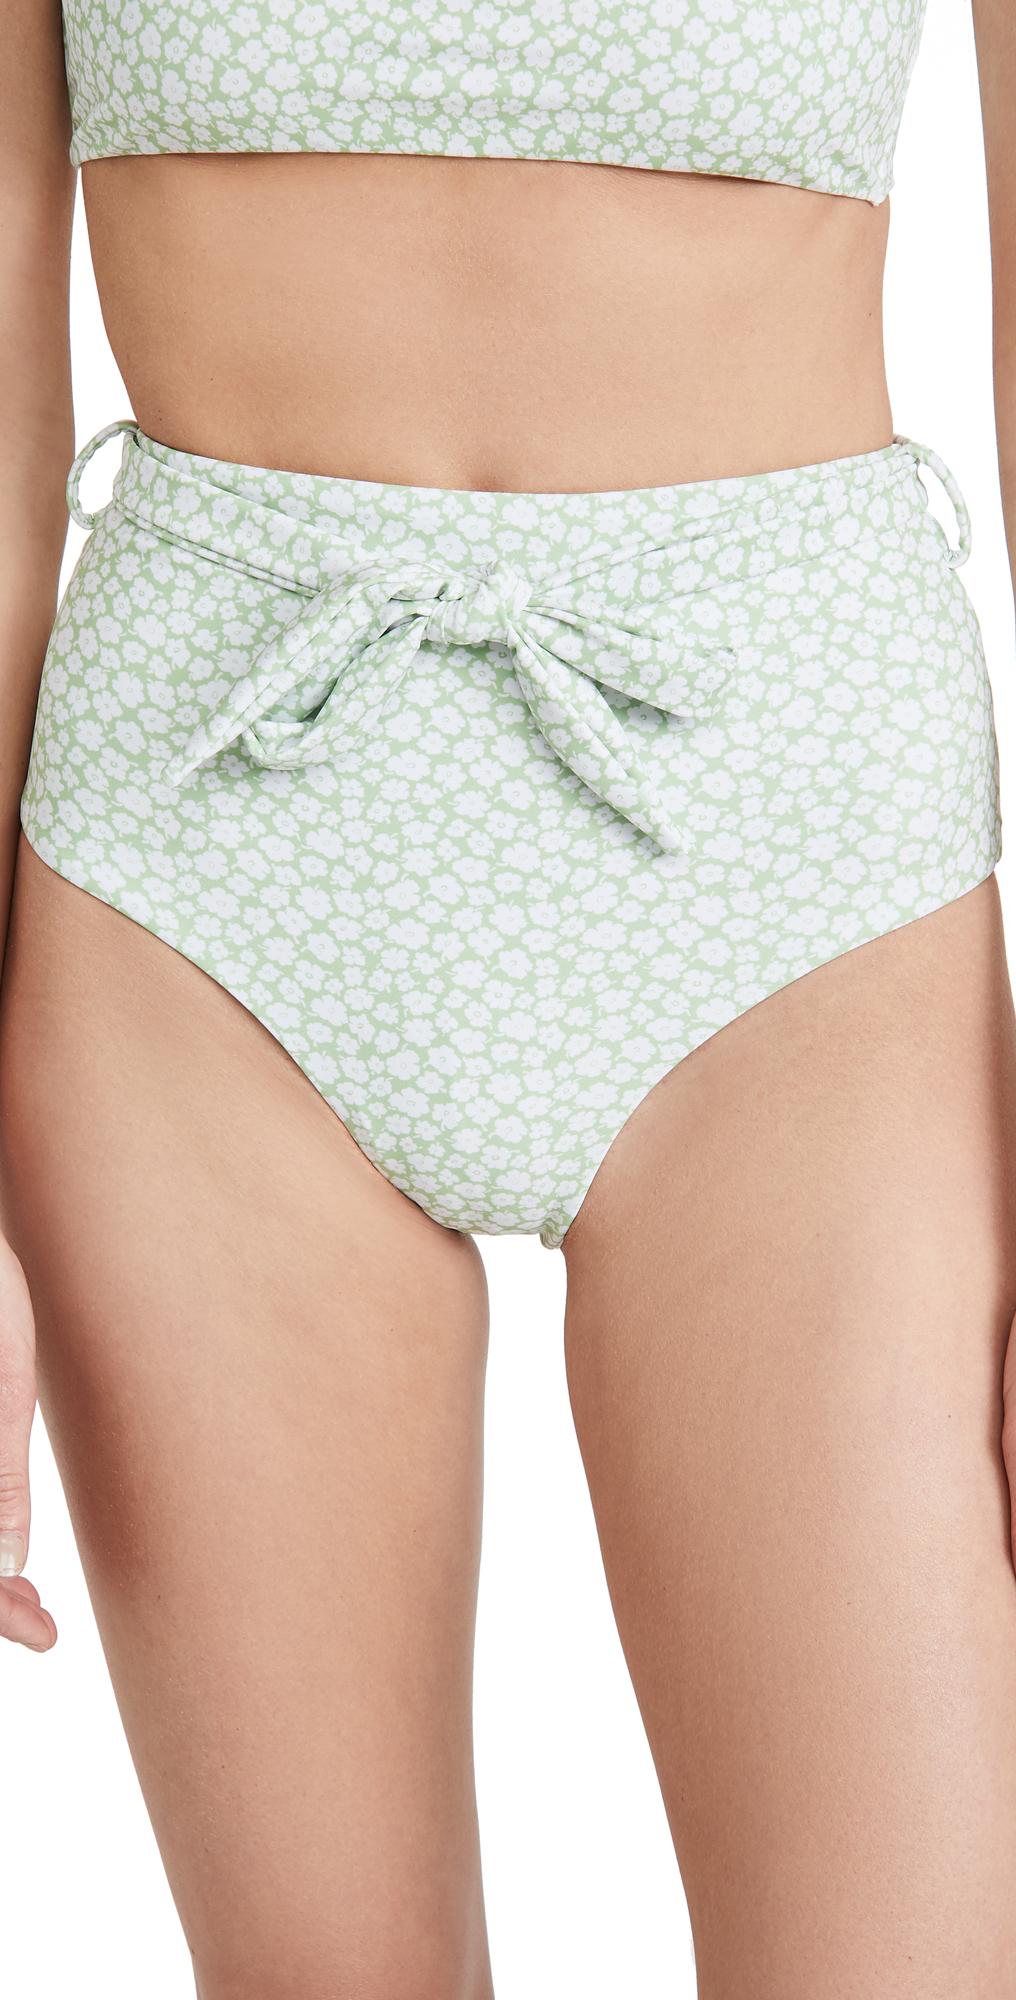 Charlie Holiday Cabana High Waisted Bikini Bottoms